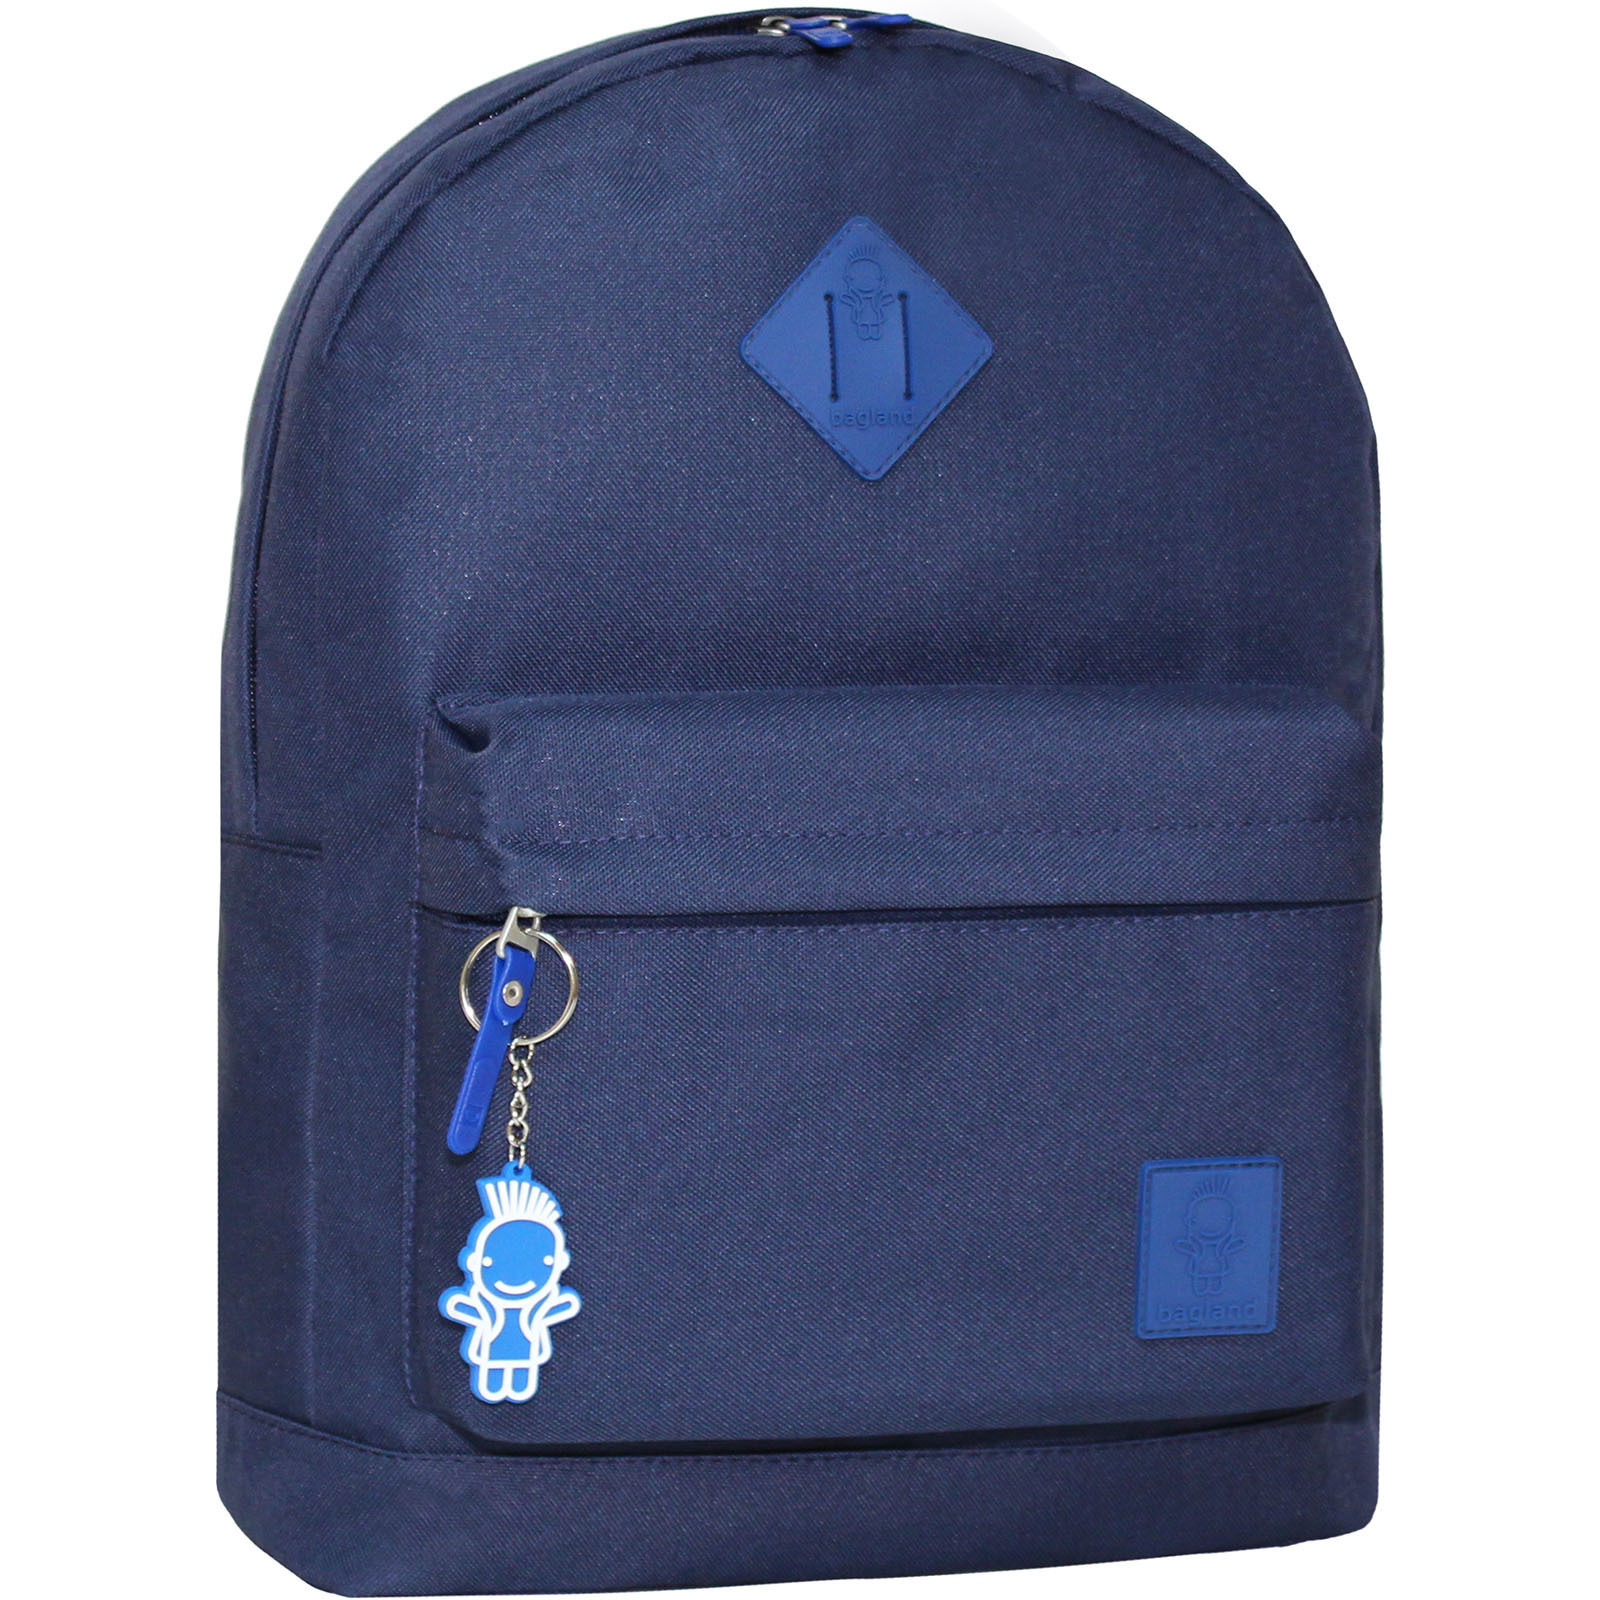 Городские рюкзаки Рюкзак Bagland Молодежный W/R 17 л. Синий (00533662) IMG_5055.JPG